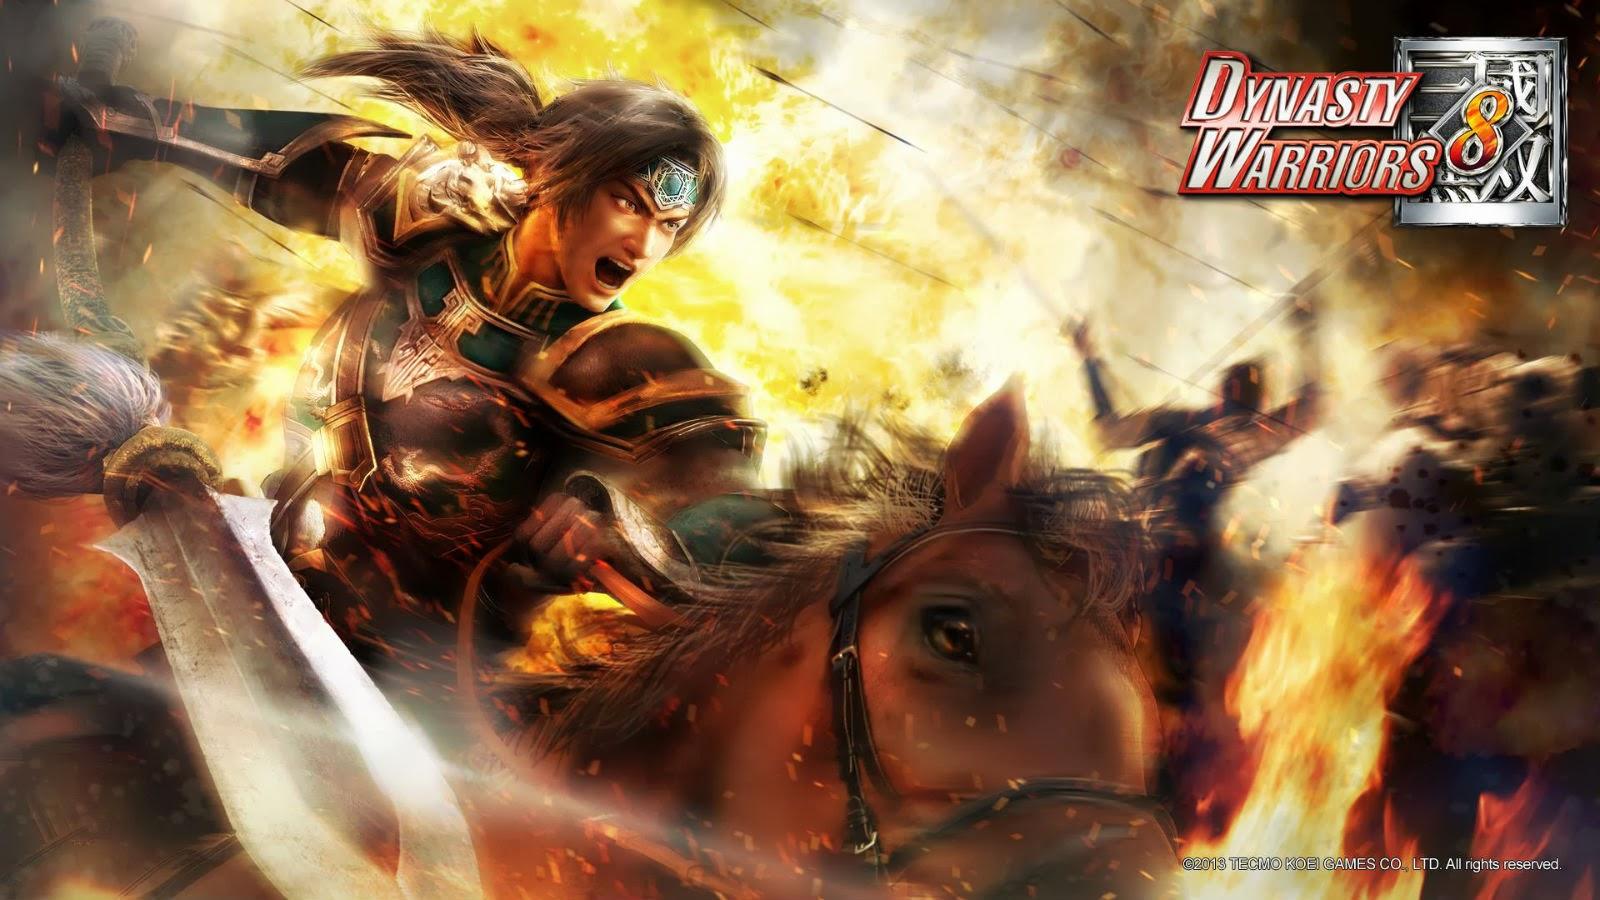 Warrior lady 3gp erotic images